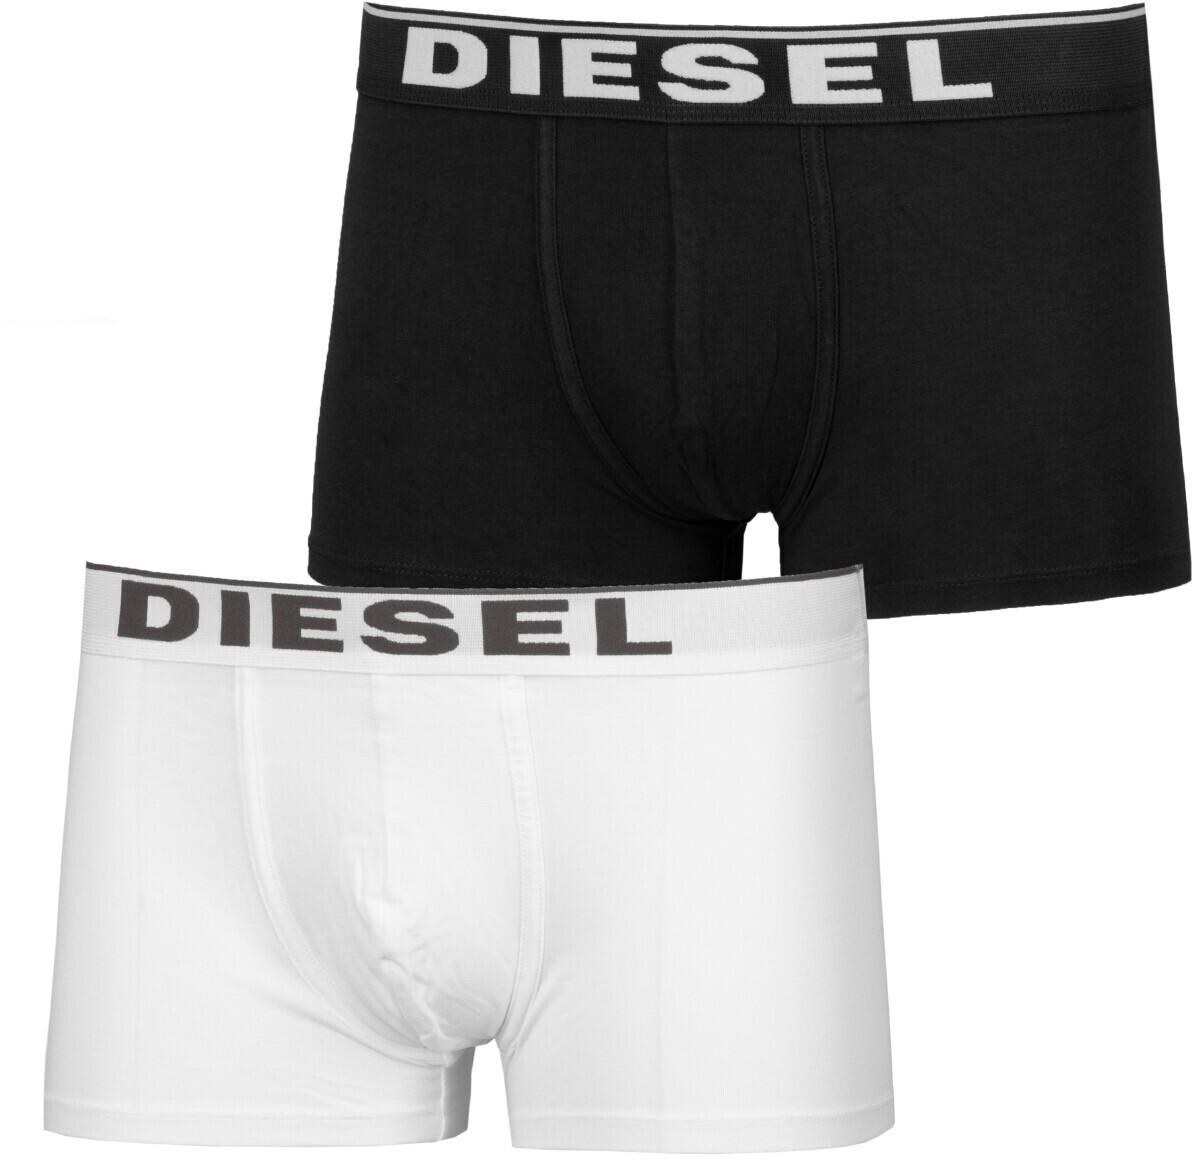 Image of Diesel 2-Pack Damien black/white (00SMKX-0JKKB-E0013)